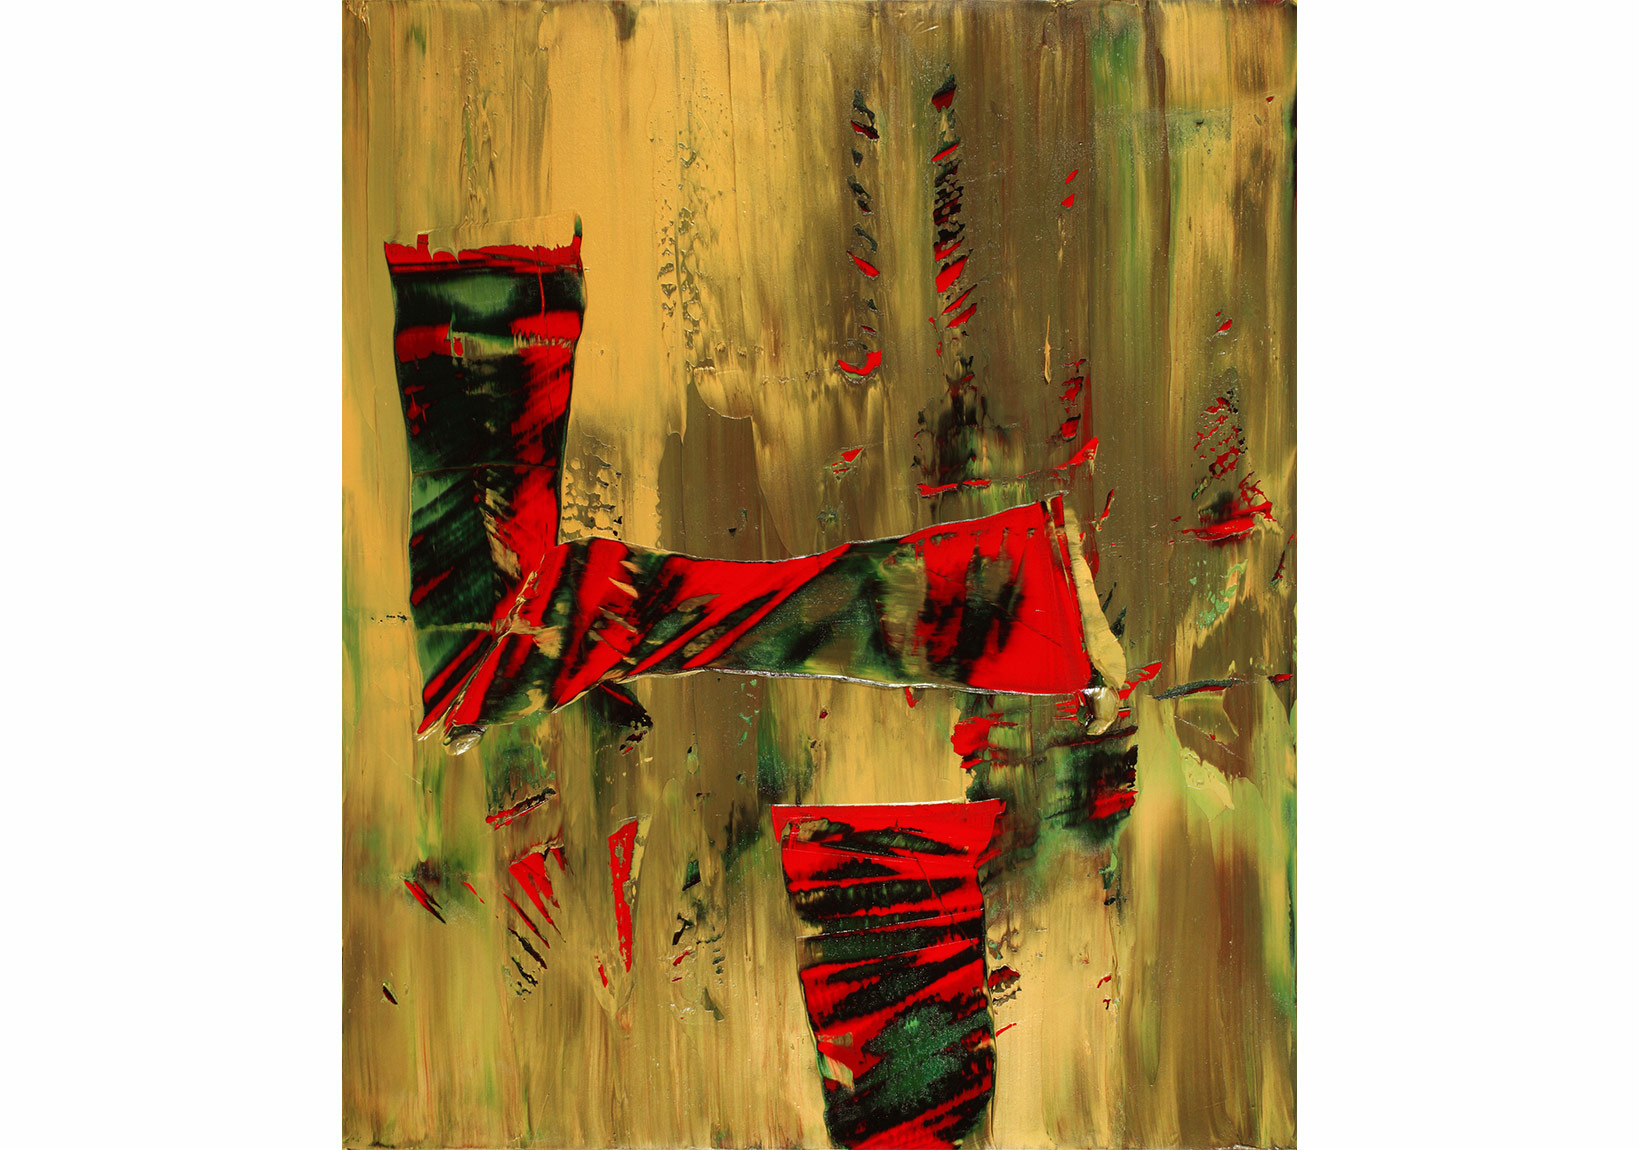 İsimsiz/Untitled, Tuval üzerine yağlıboya/oil on canvas, 120 x 100 cm